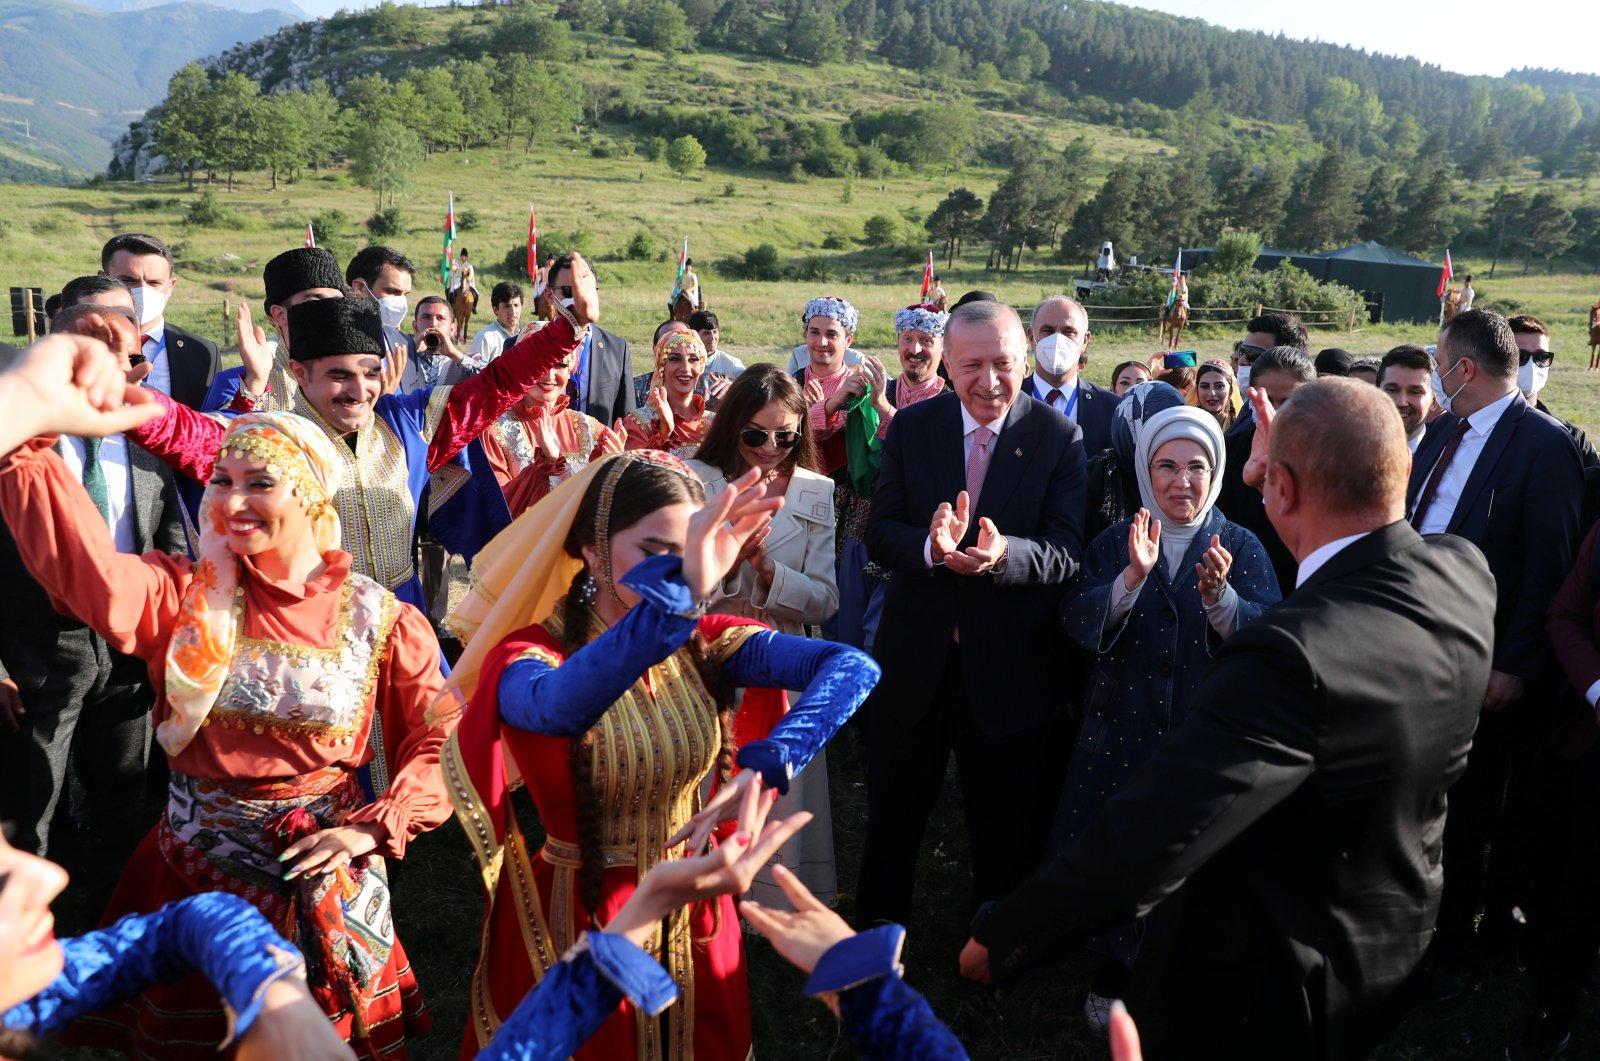 President Recep Tayyip Erdoğan (3rd R) and Azerbaijan's President Ilham Aliyev (R), accompanied by their wives Emine Erdoğan (2nd R) and Mehriban Aliyeva (4th R), attend a local festival in Shusha in the Nagorno-Karabakh region, Azerbaijan, June 15, 2021. (Retuers Photo)